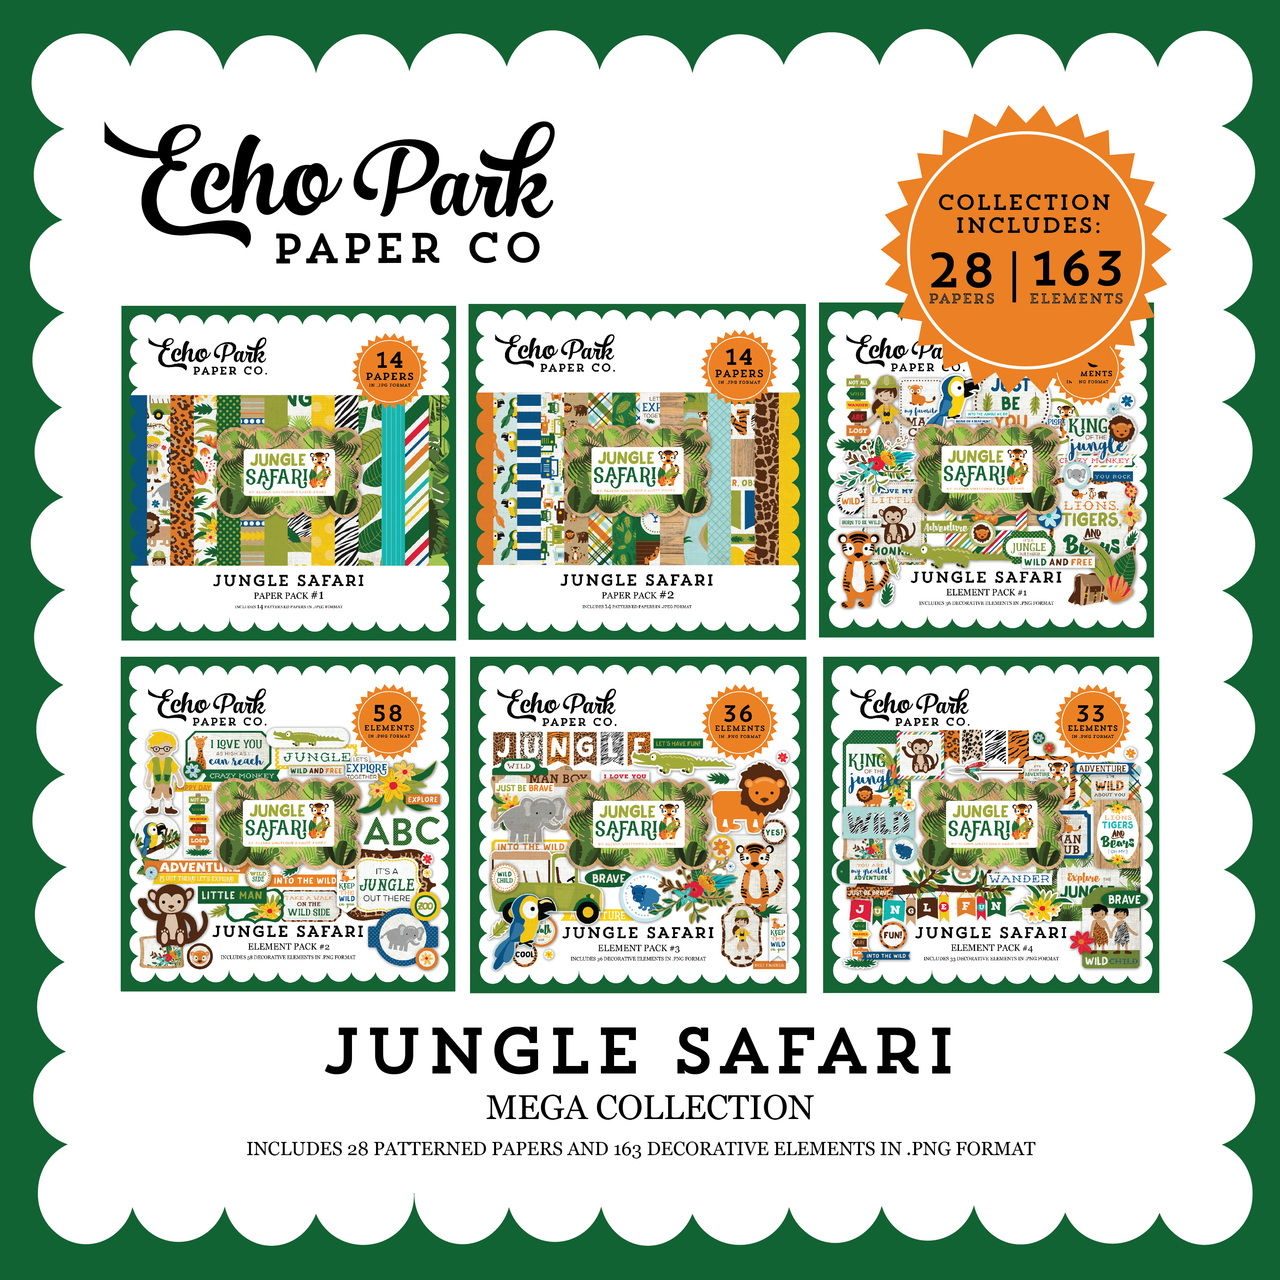 Jungle Safari Mega Collection